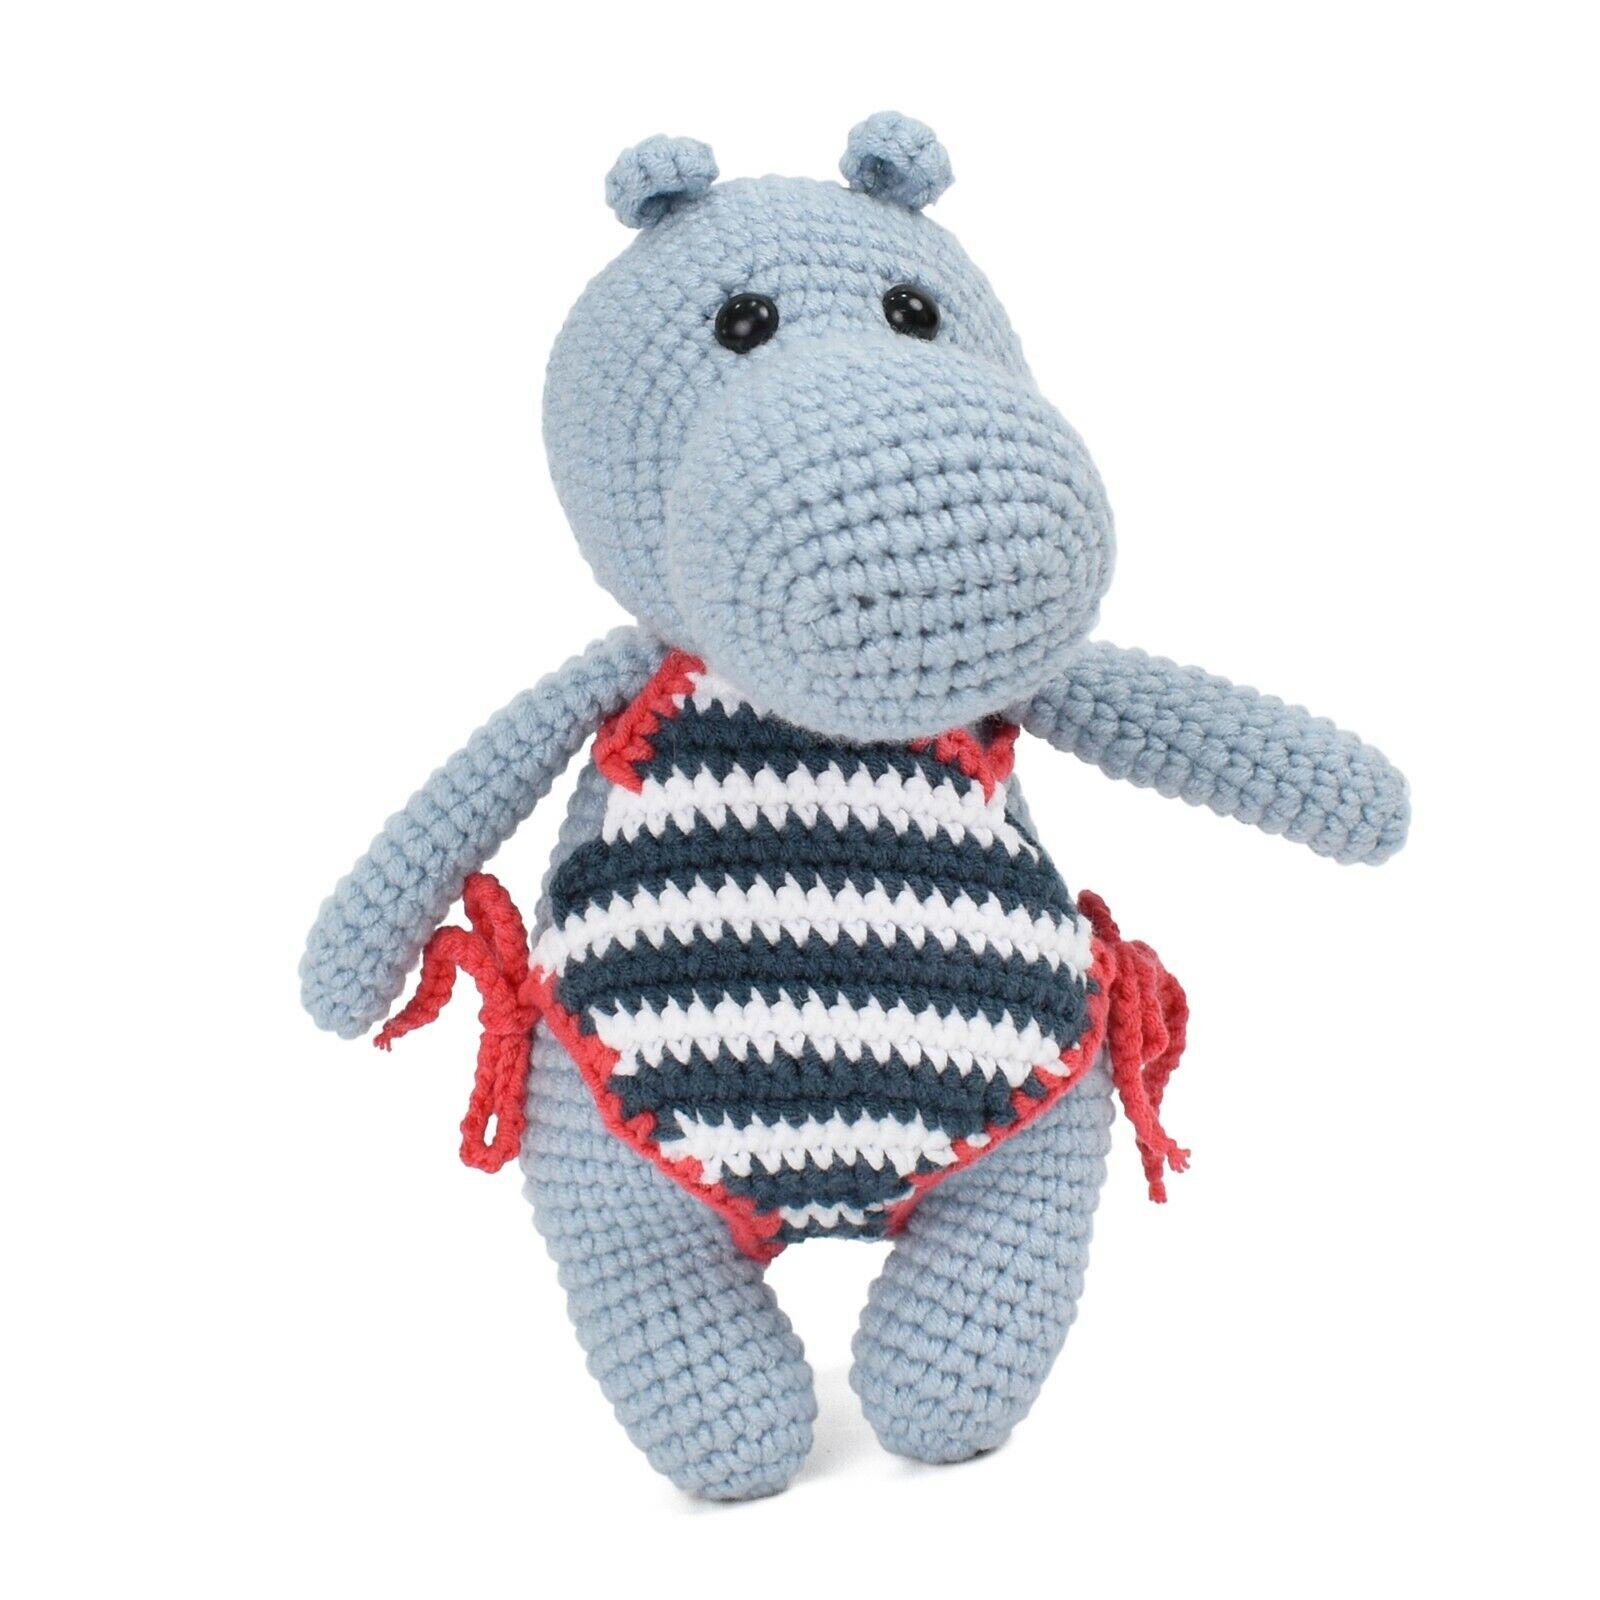 Crochet Hippo toy Knitted Hippo behemoth amigurumi hippo Crochet ... | 1600x1600